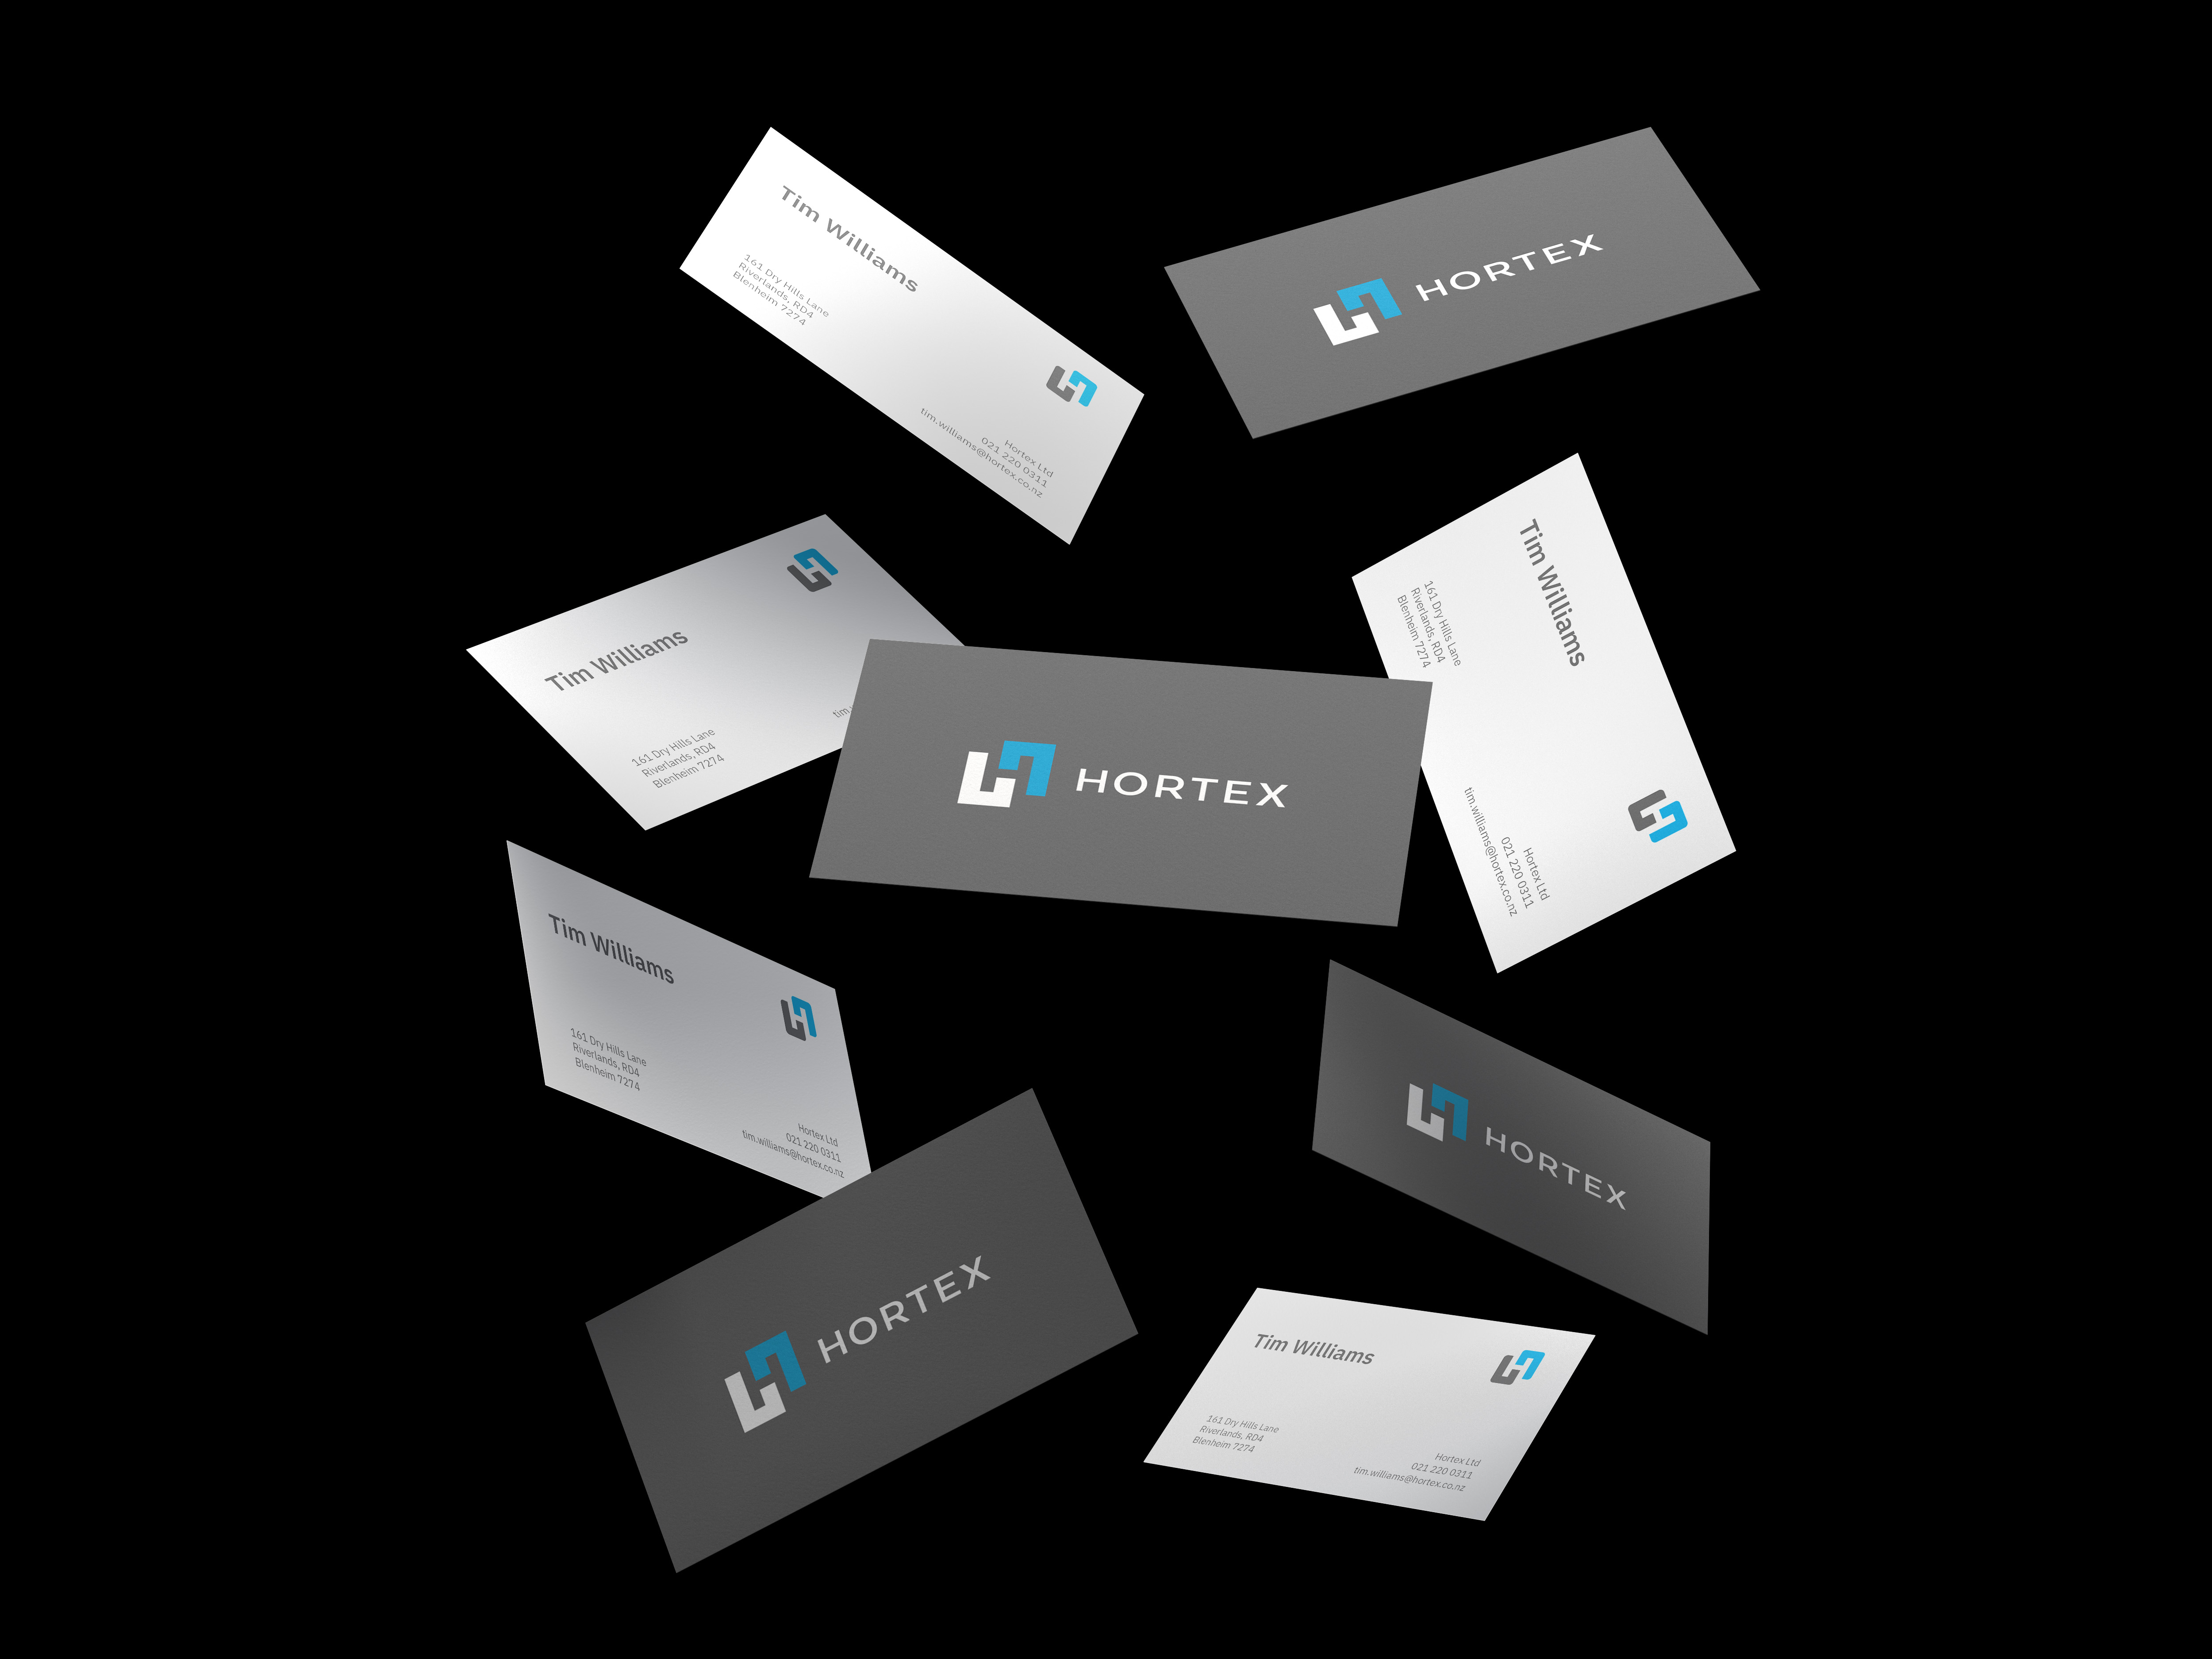 Hortex Branding